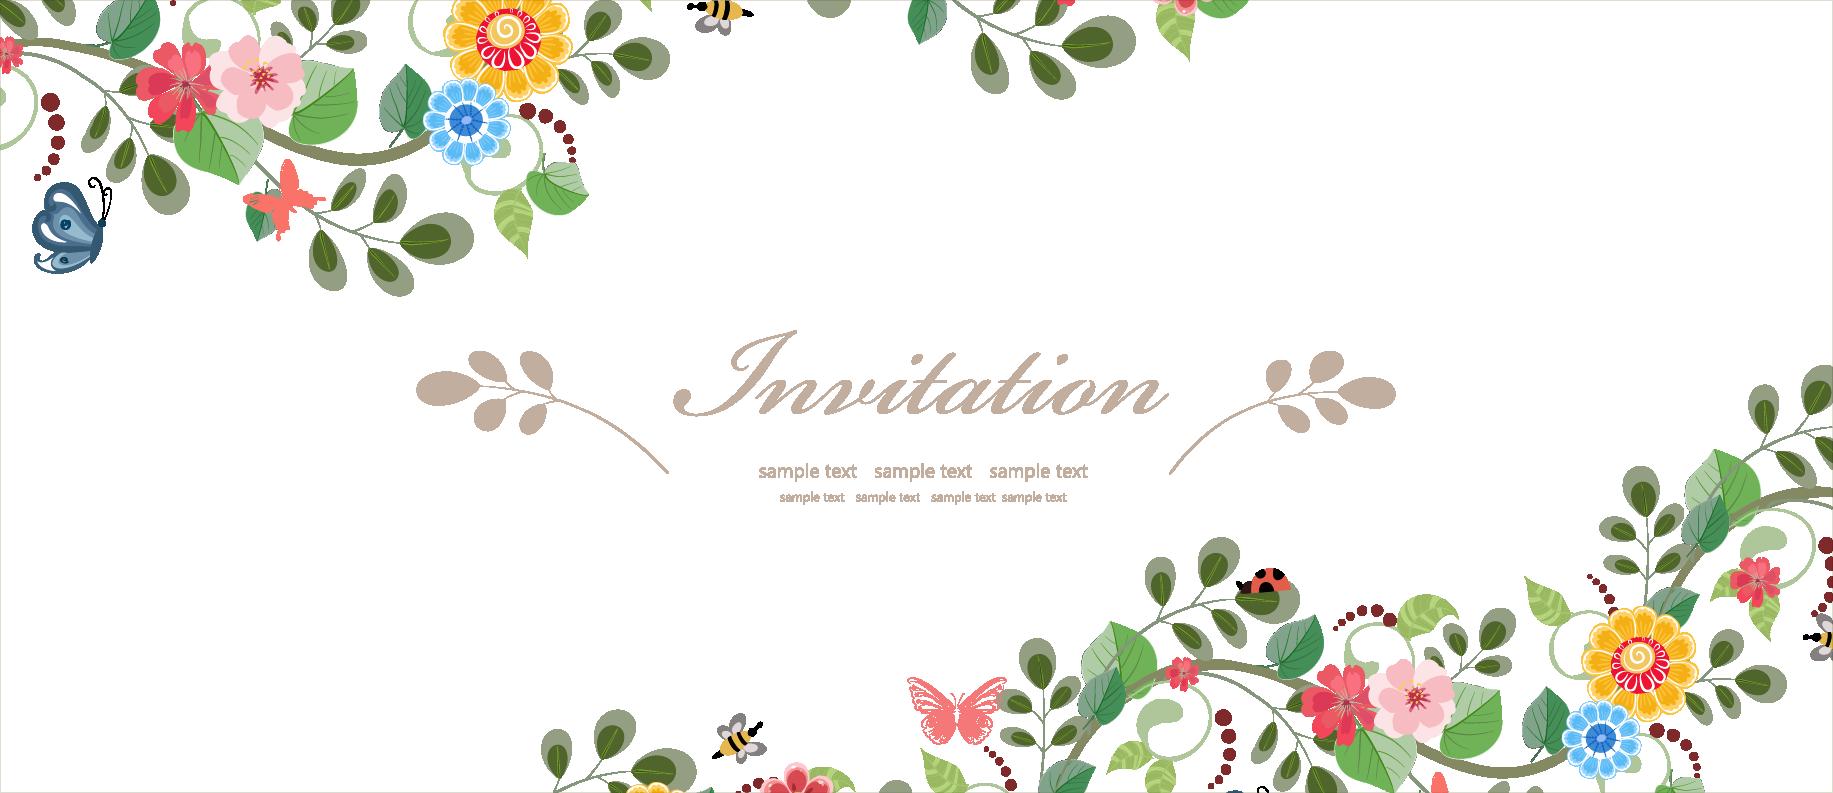 Transparent wedding flower clipart - Wedding Invitation Flower Euclidean Vector - Flower Invitation Vector Free